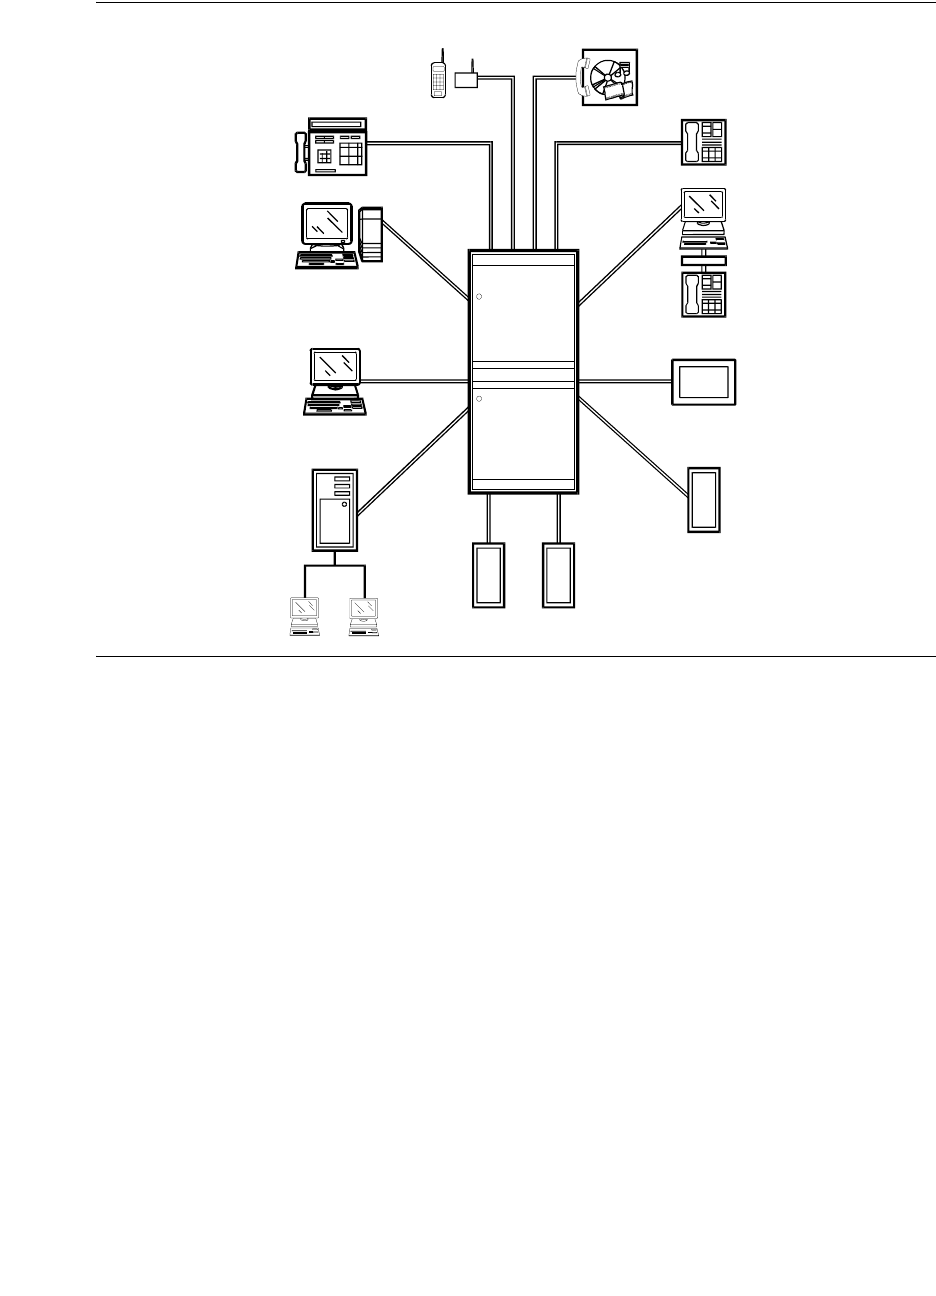 Avaya Communication Manager Hardware Guide Subwooferampwiringdiagram Updated Neon Wiring Diagram My B9 Definity Server R